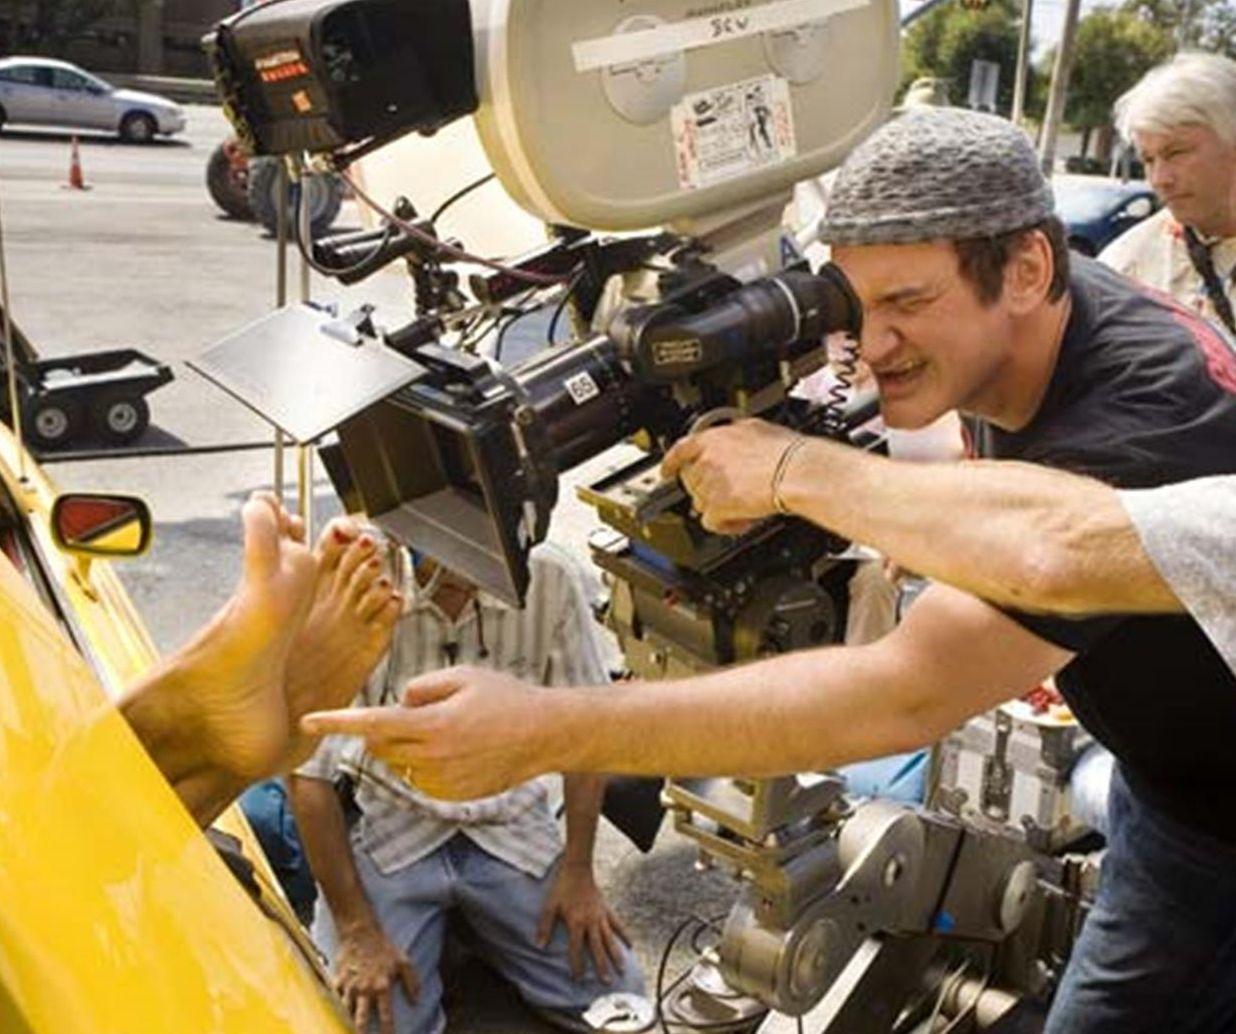 Quentin Tarantino filming some feet